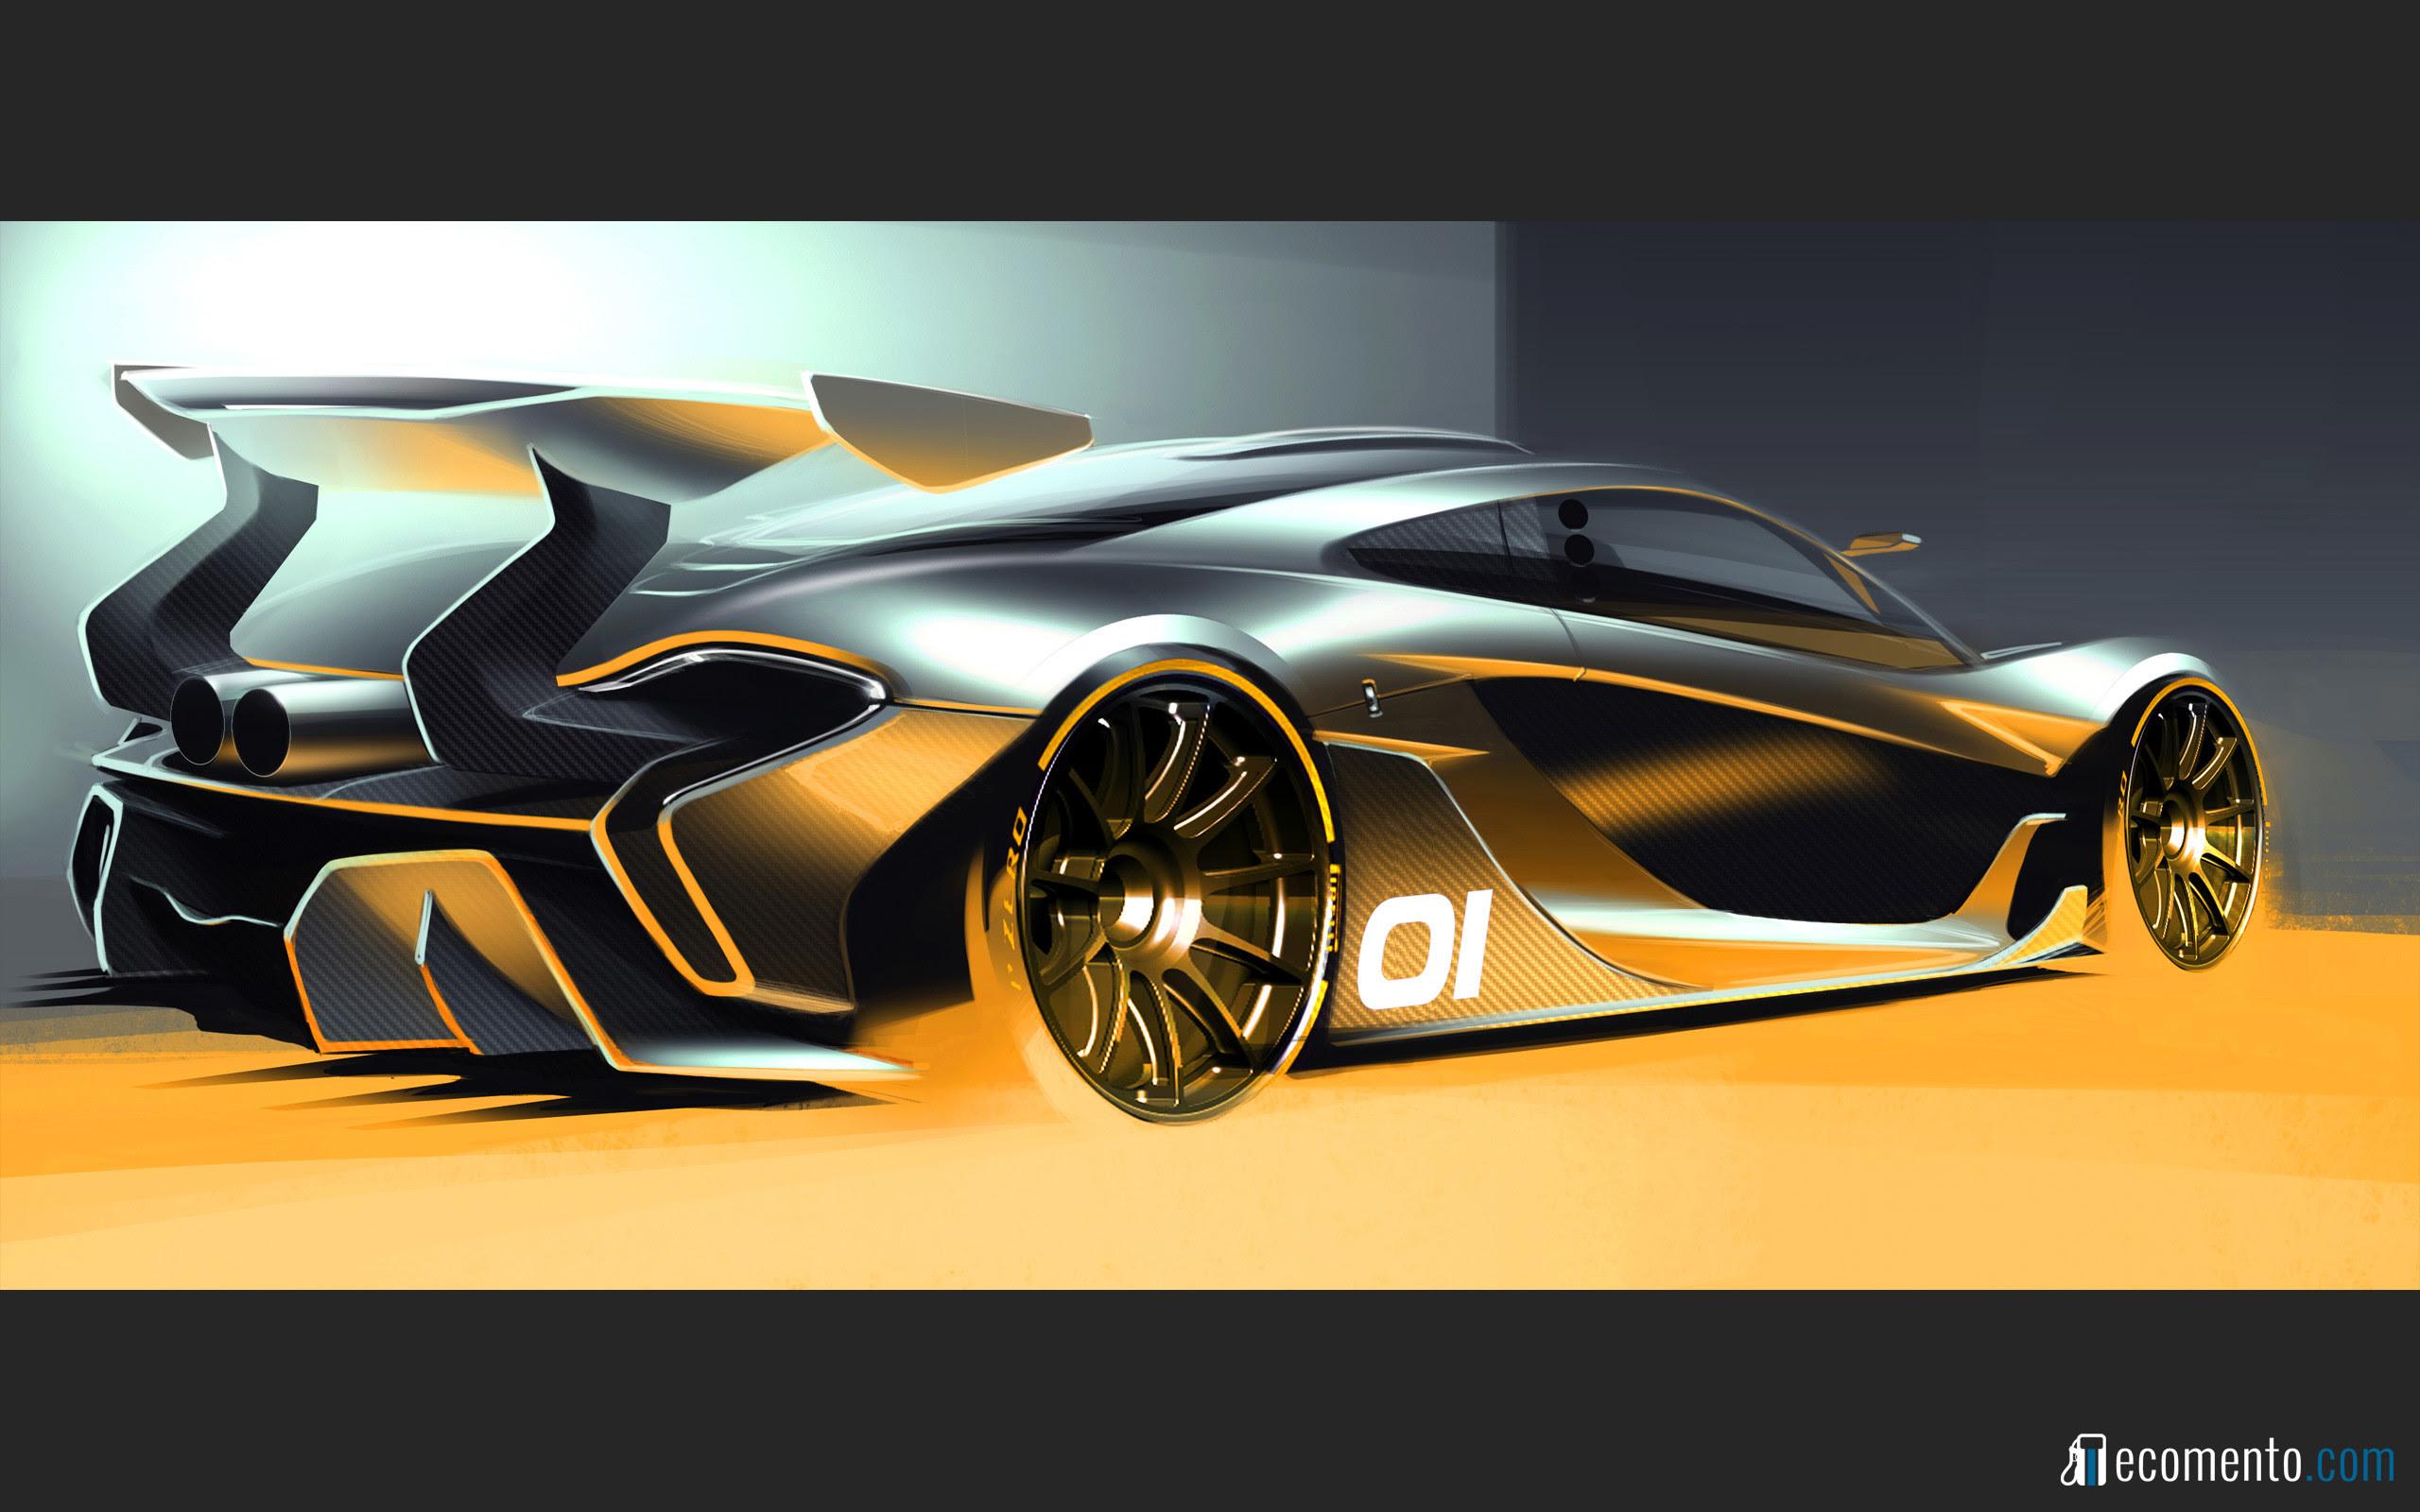 Mclaren P1 Wallpaper 4k Sports Cars Wallpapers Hd